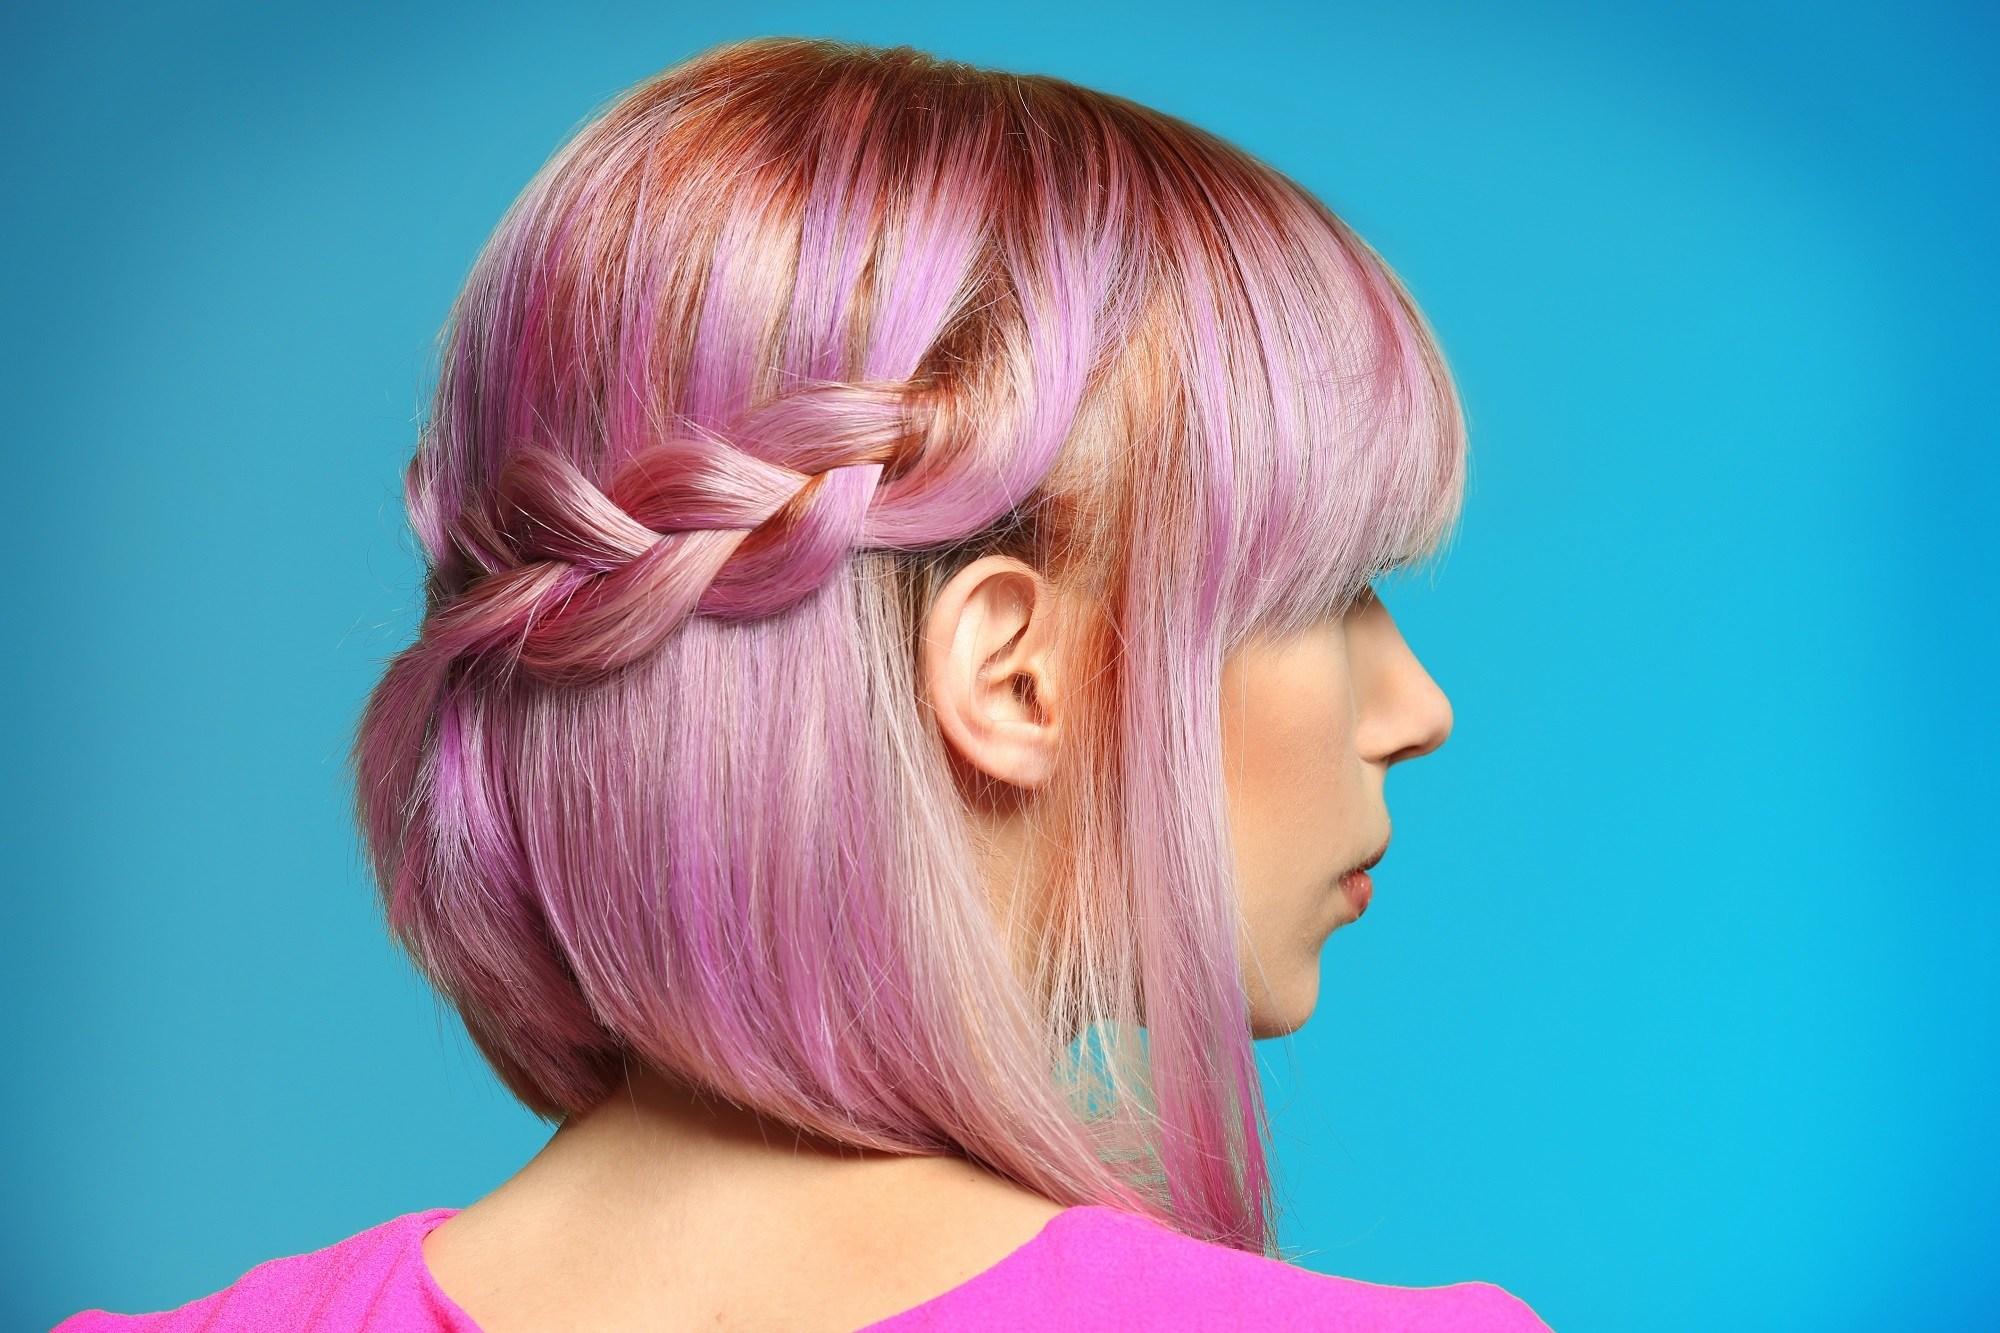 Girl with purple short hair in Dutch lace half braid